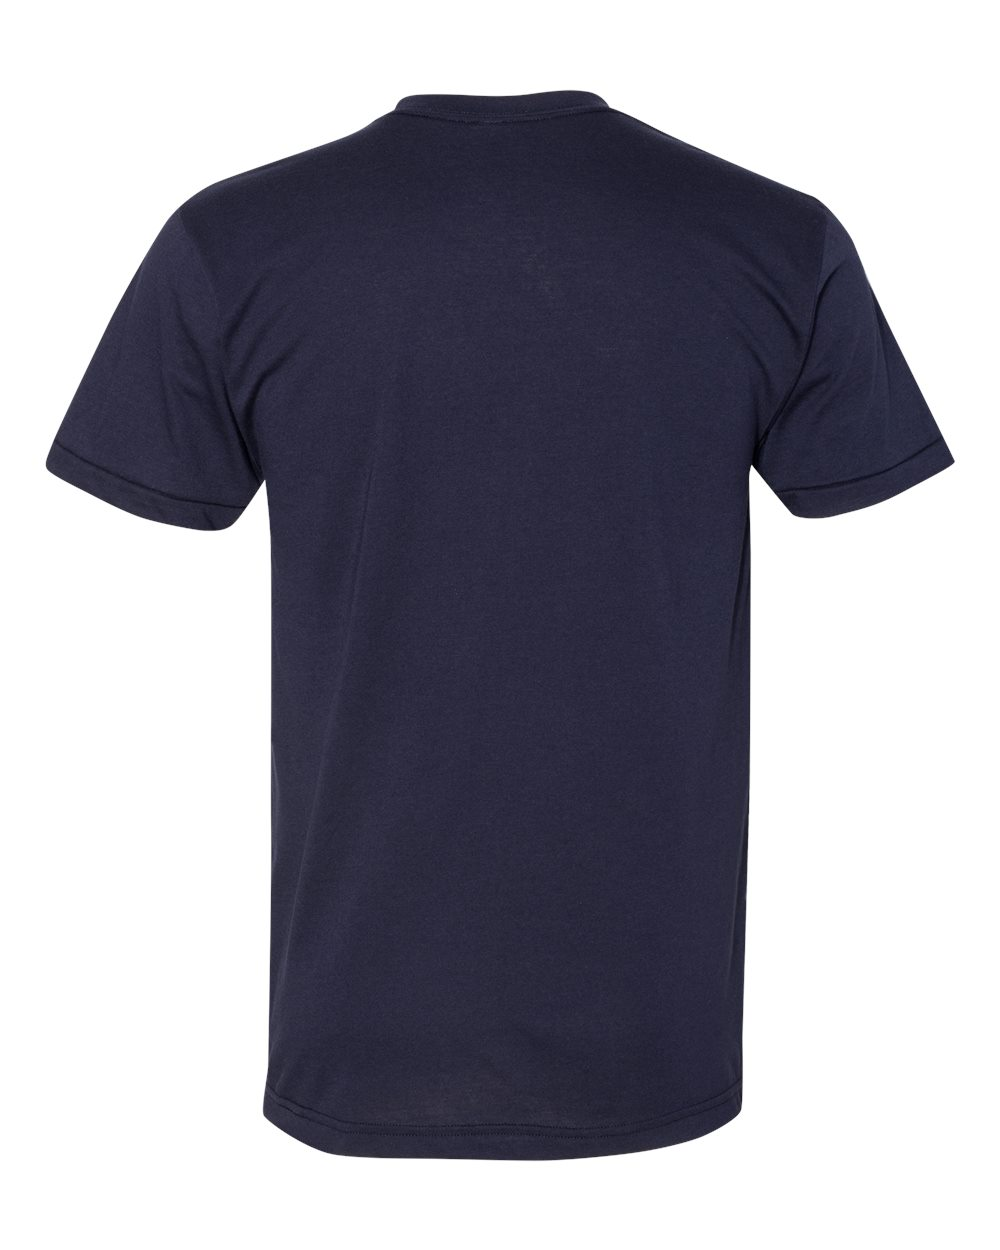 American-Apparel-Mens-Slim-Fit-50-50-Cotton-T-Shirt-Tee-BB401W-up-to-2XL thumbnail 43